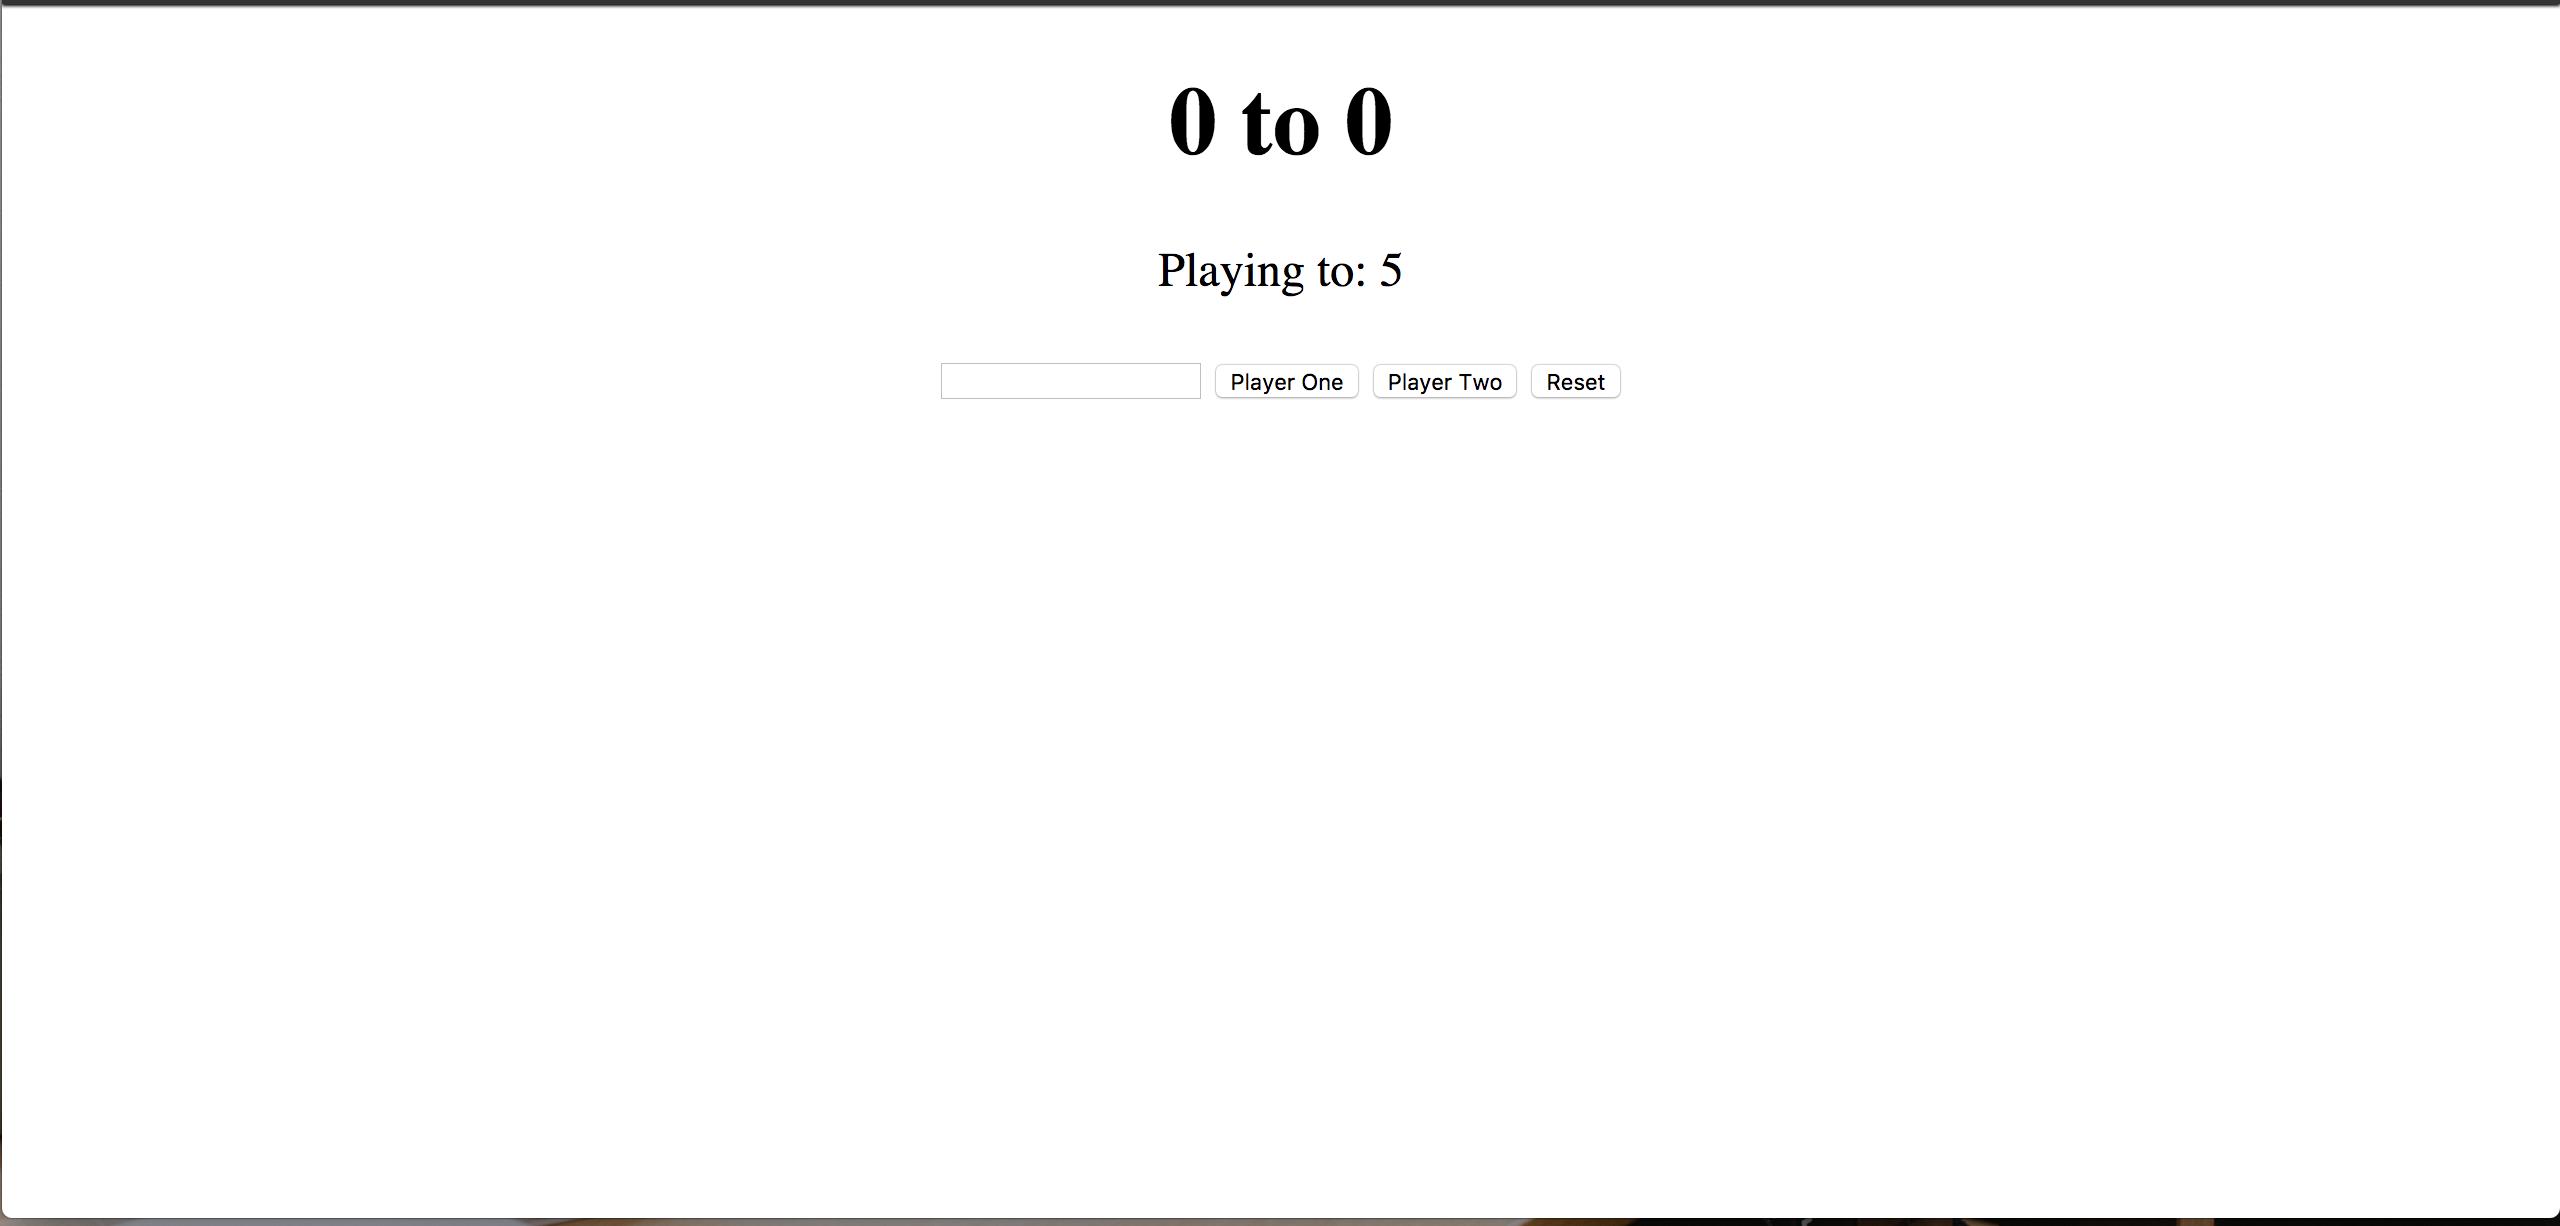 screen shot of score-keeper-project